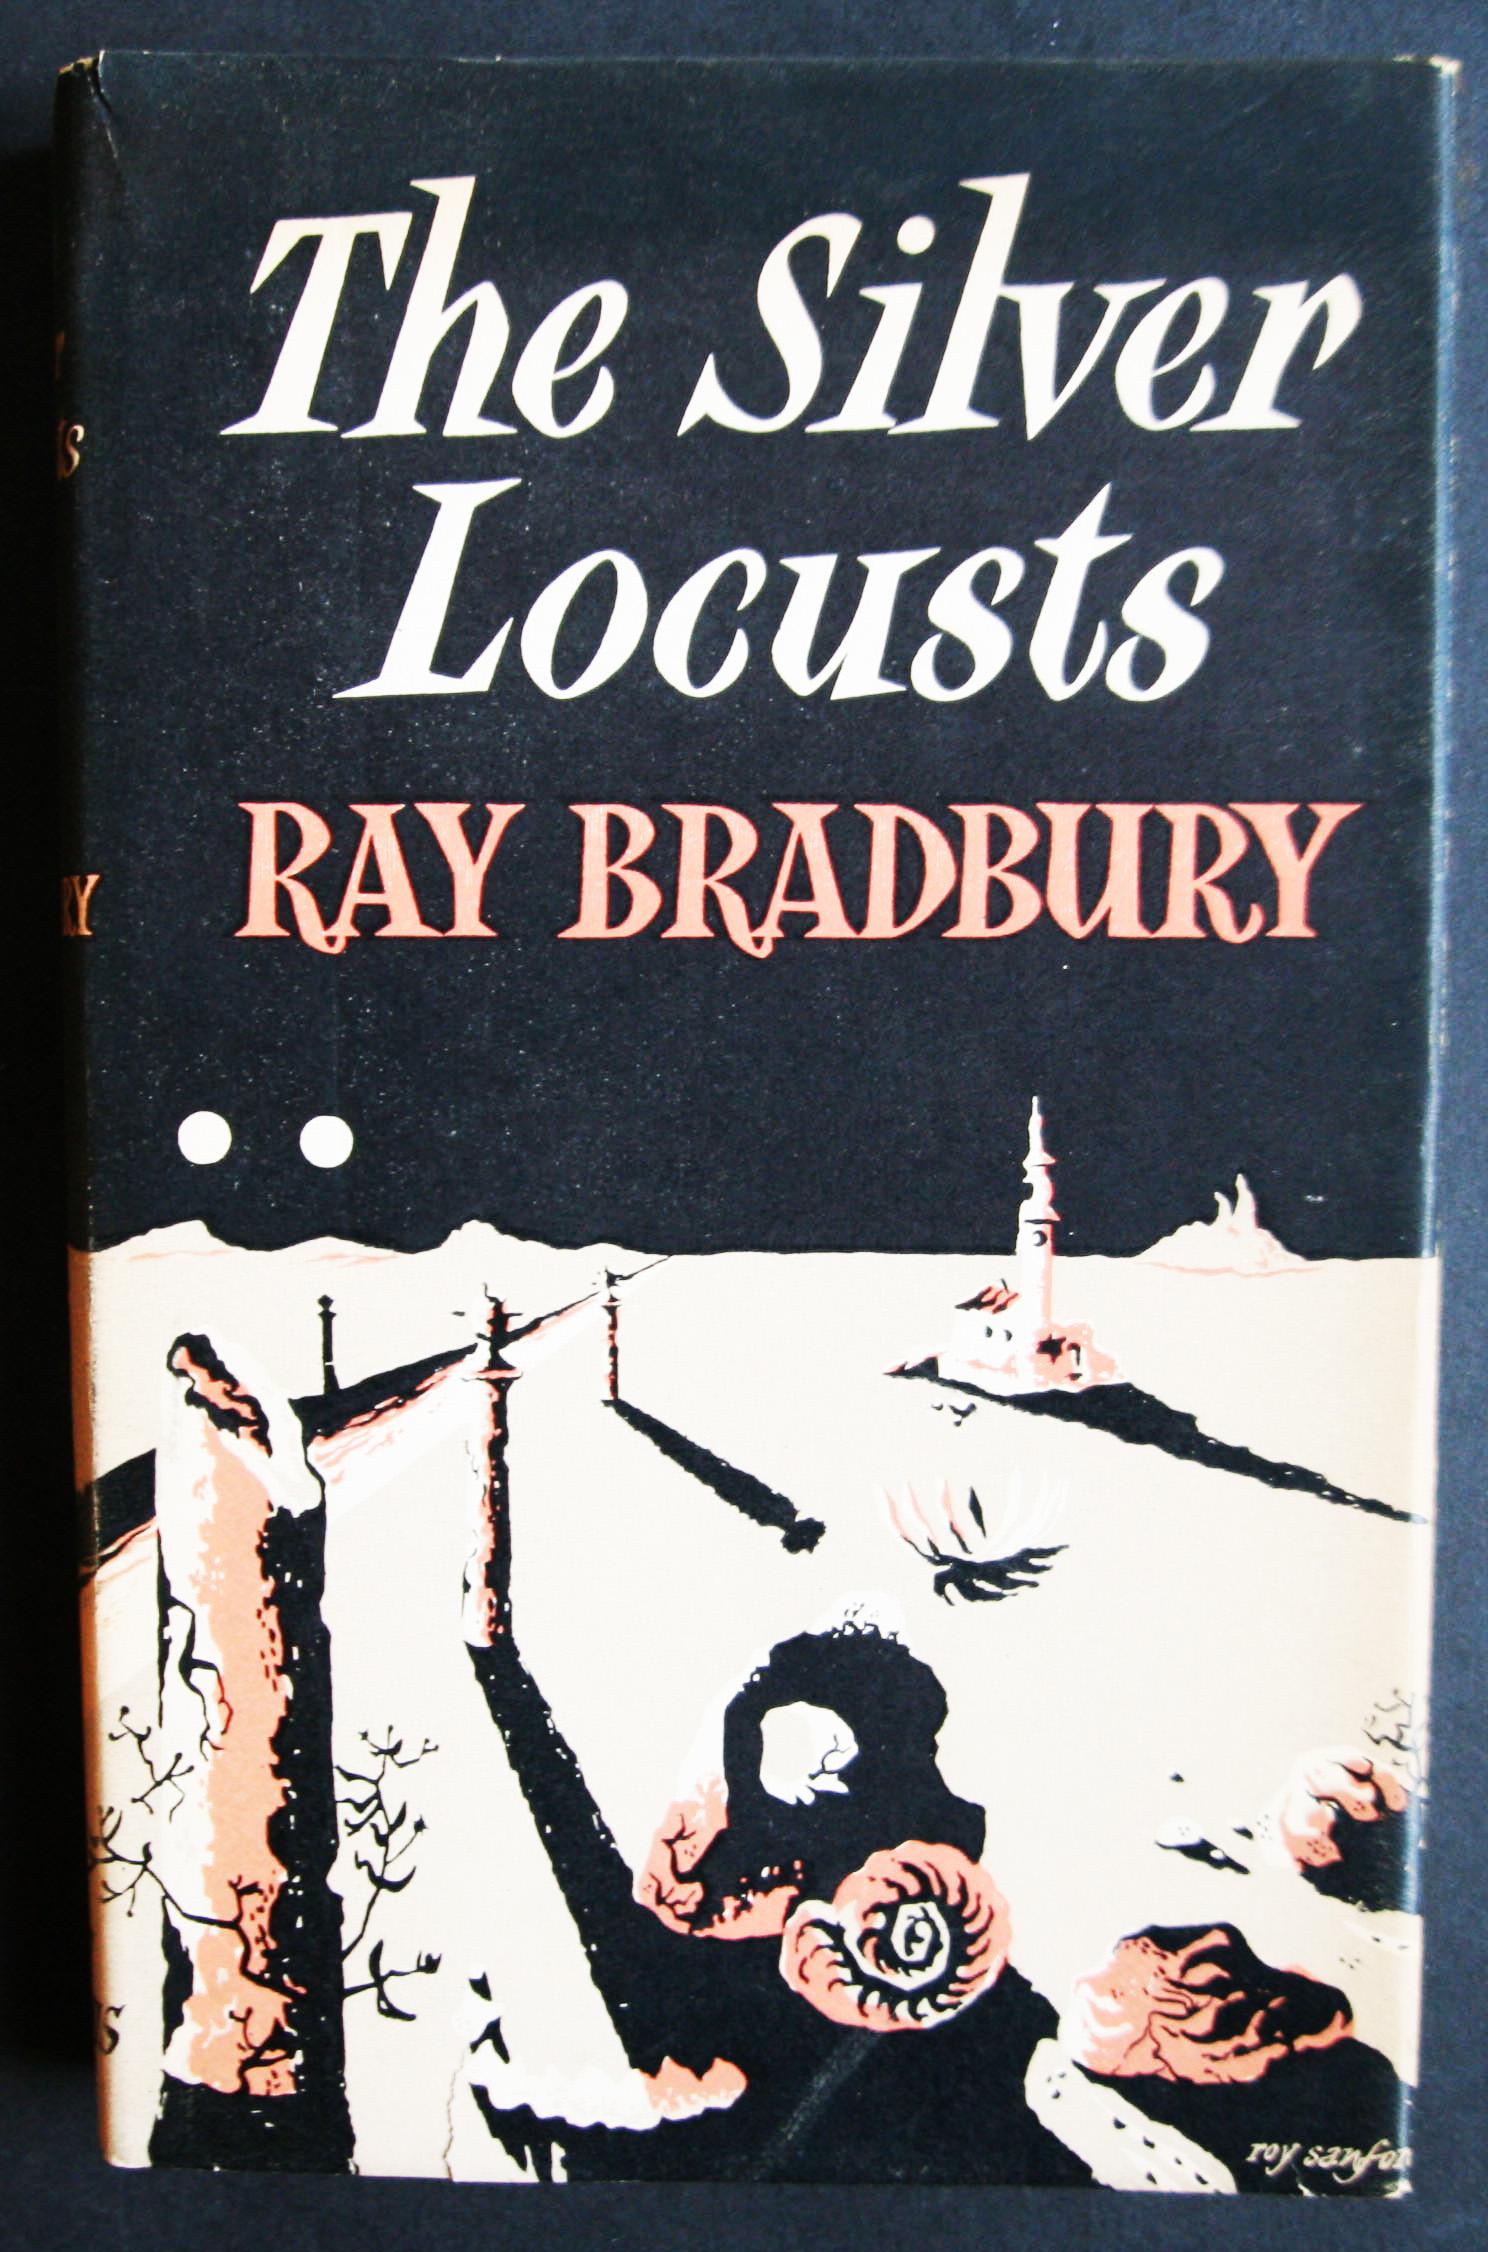 Ray Bradbury The Silver Locust first edition